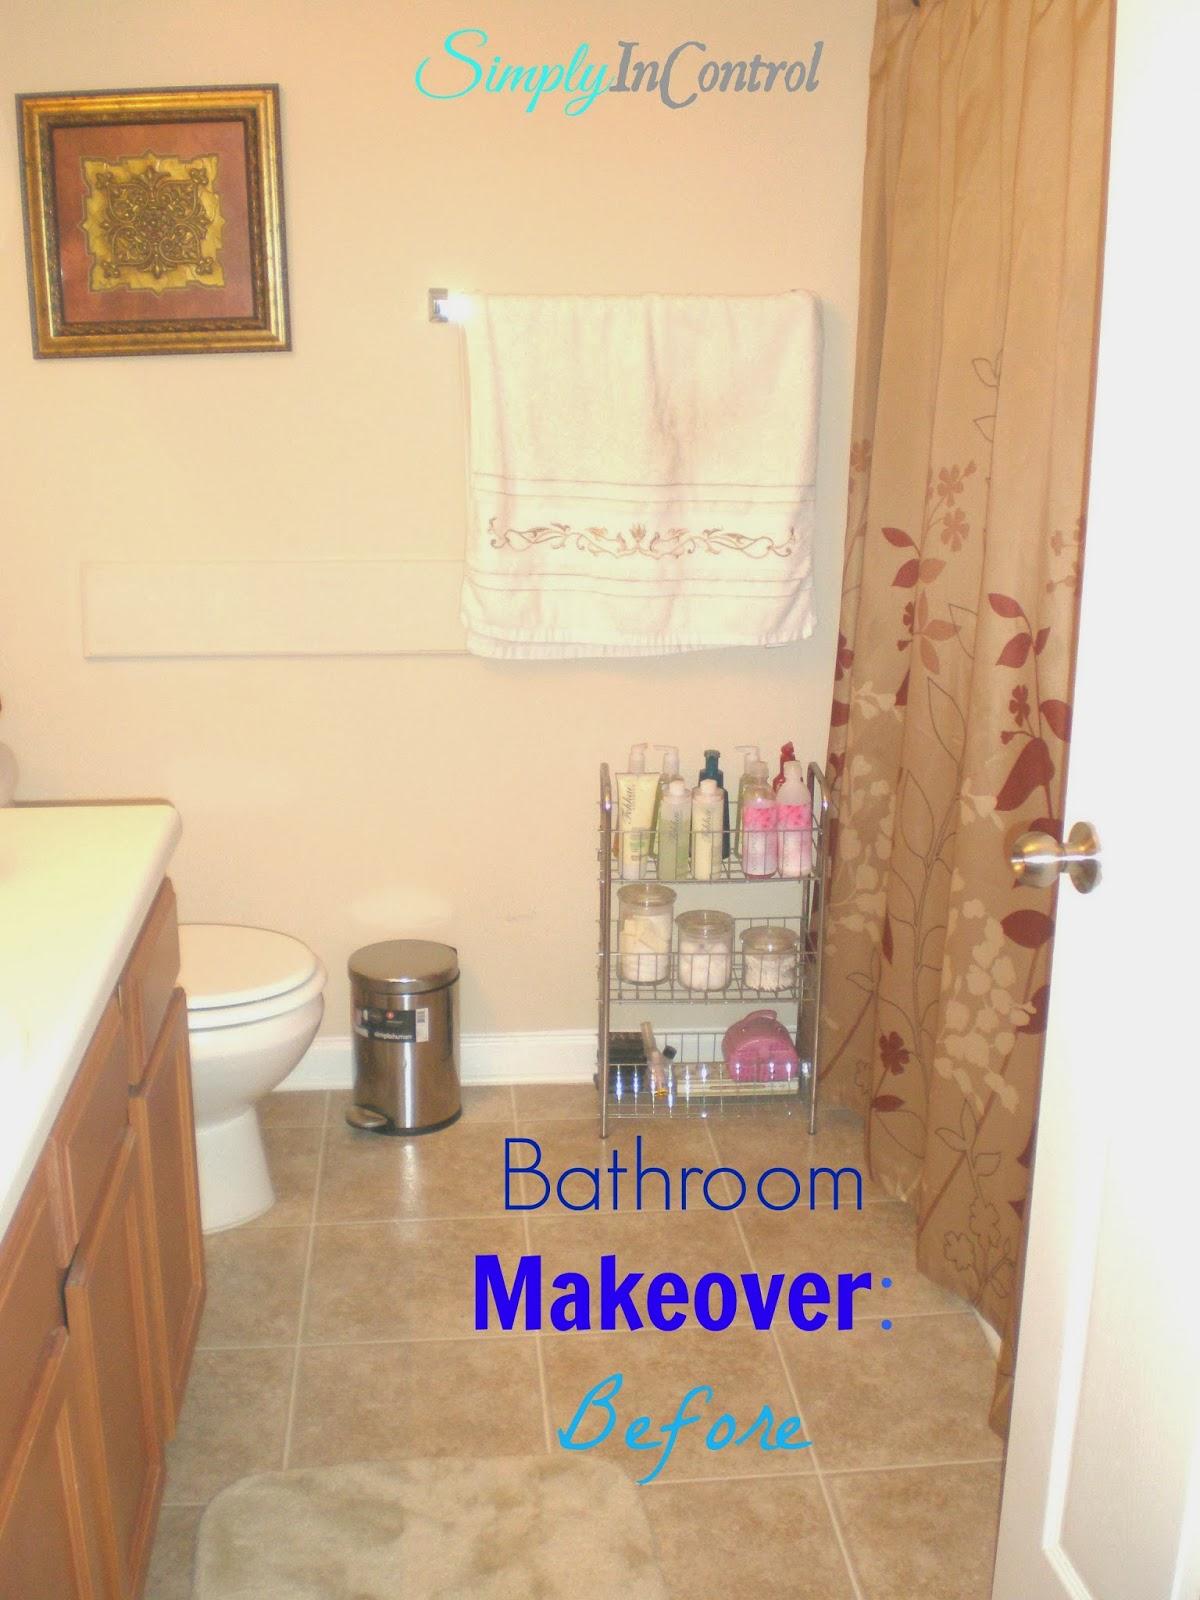 http://1.bp.blogspot.com/-bRggP_D2dCw/UqILWNpvjfI/AAAAAAAACTI/QFp_2nUim98/s1600/bathroom1.jpg